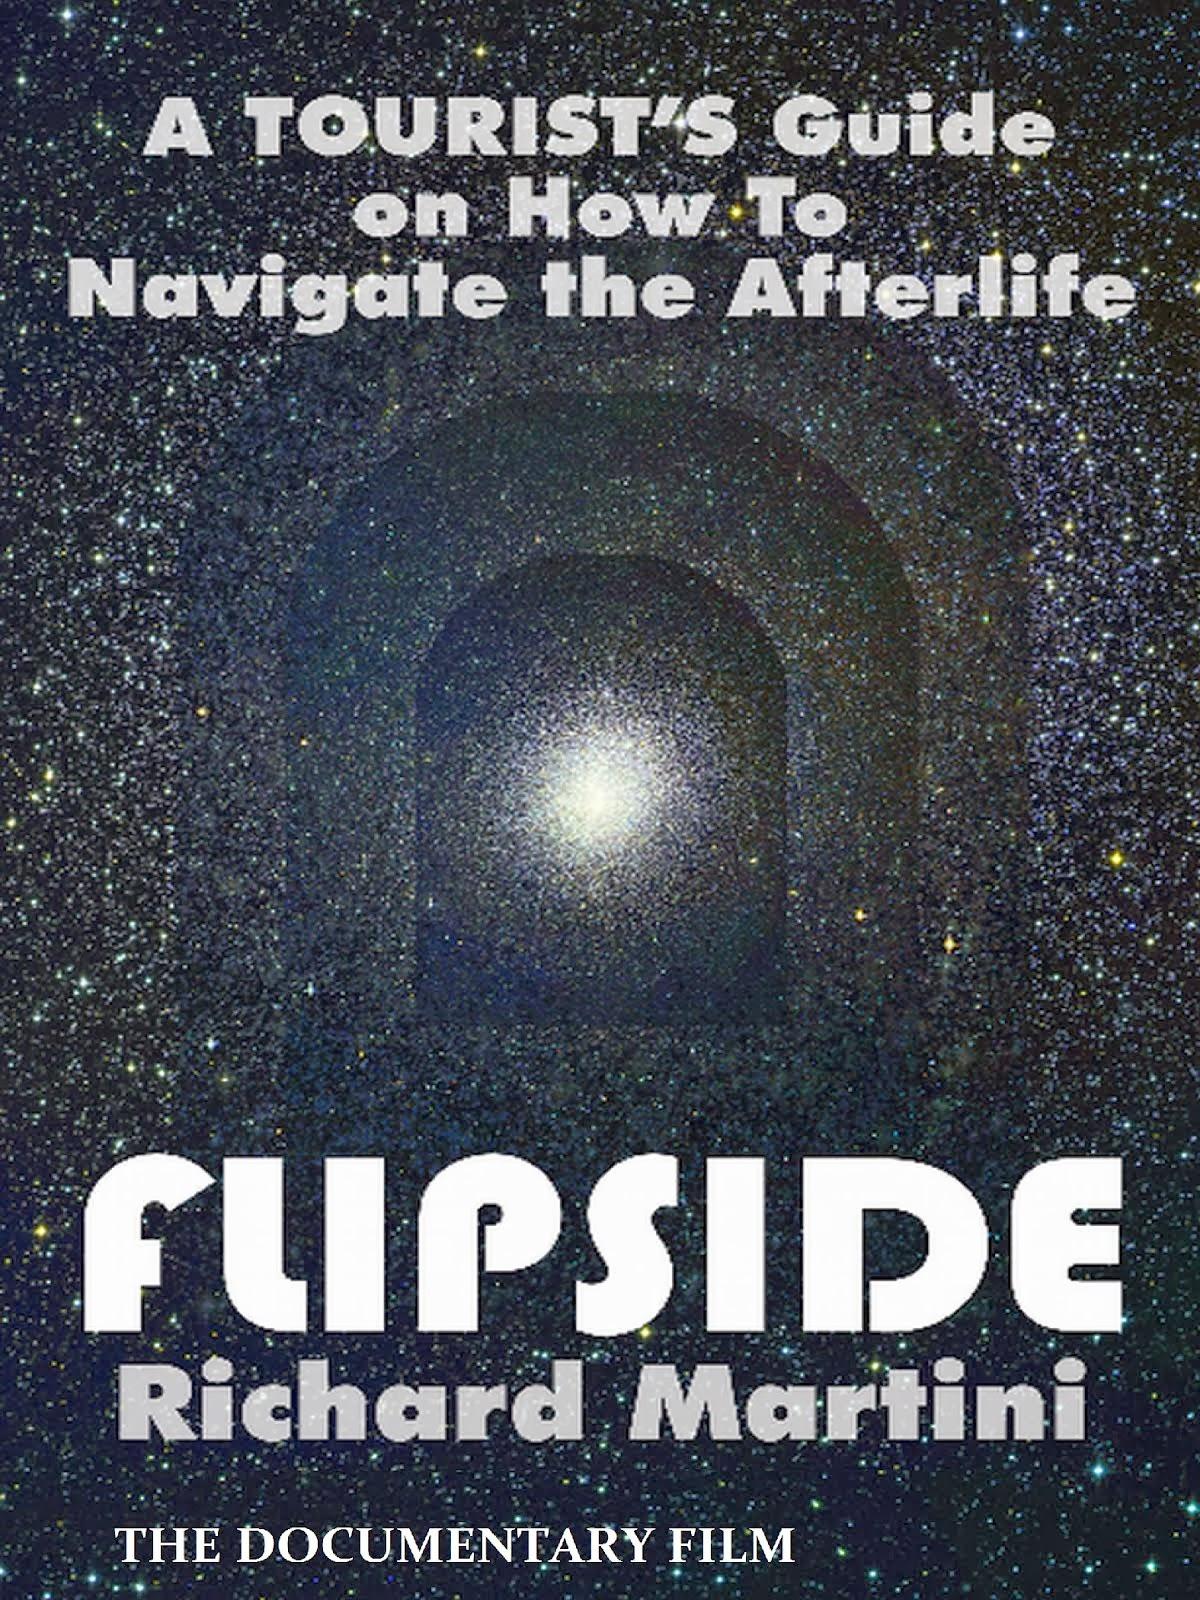 DVD of Flipside